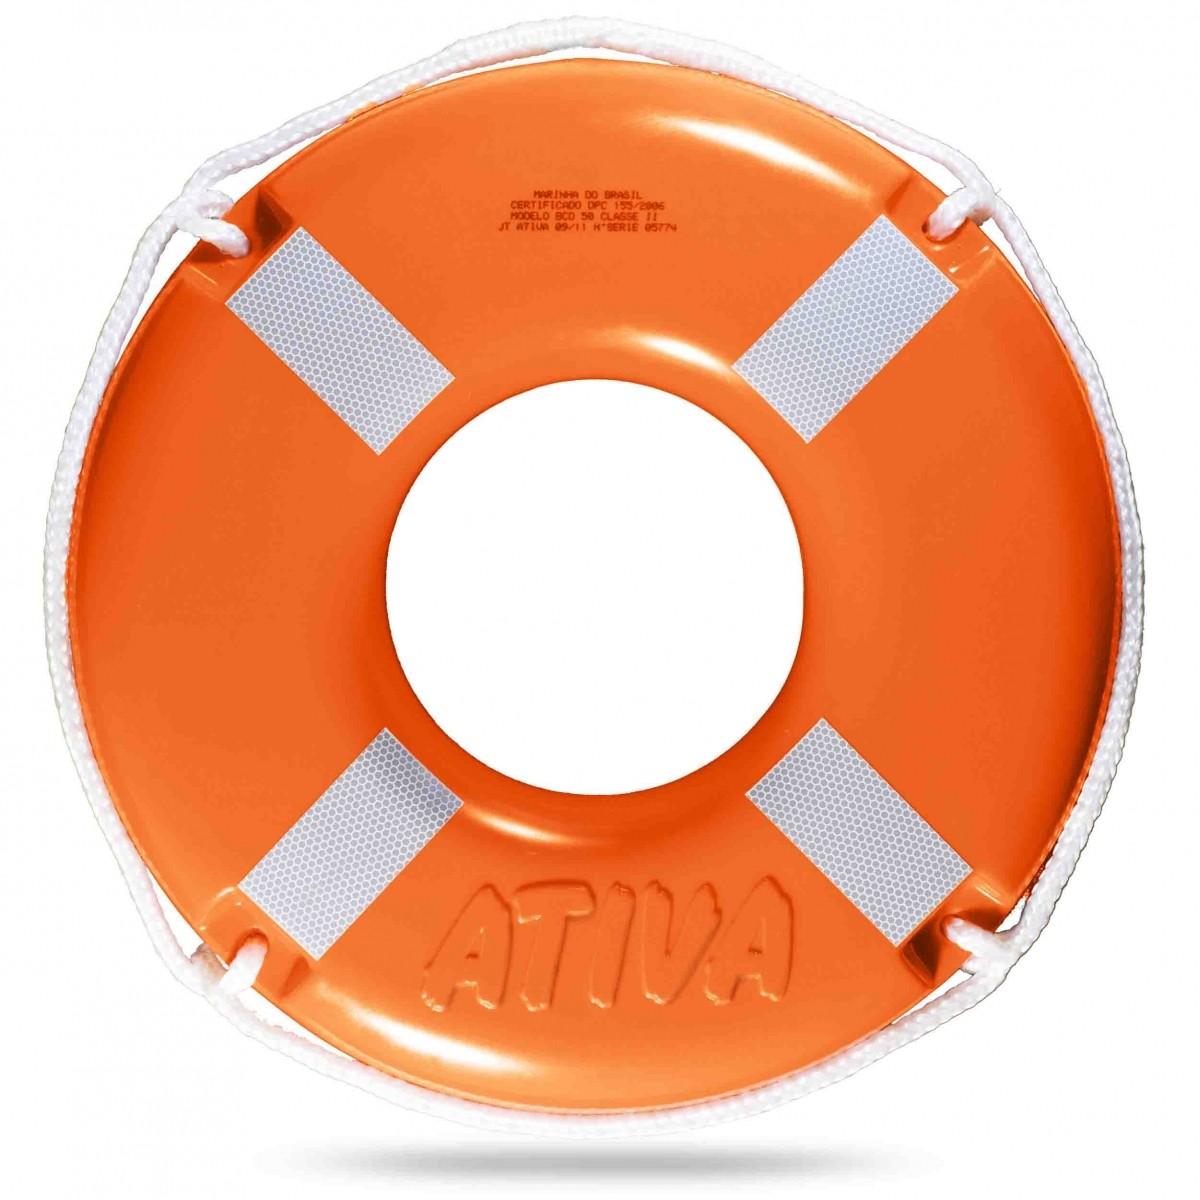 Boia Salva-Vidas Classe II  - Radical Peças - Peças para Jet Ski